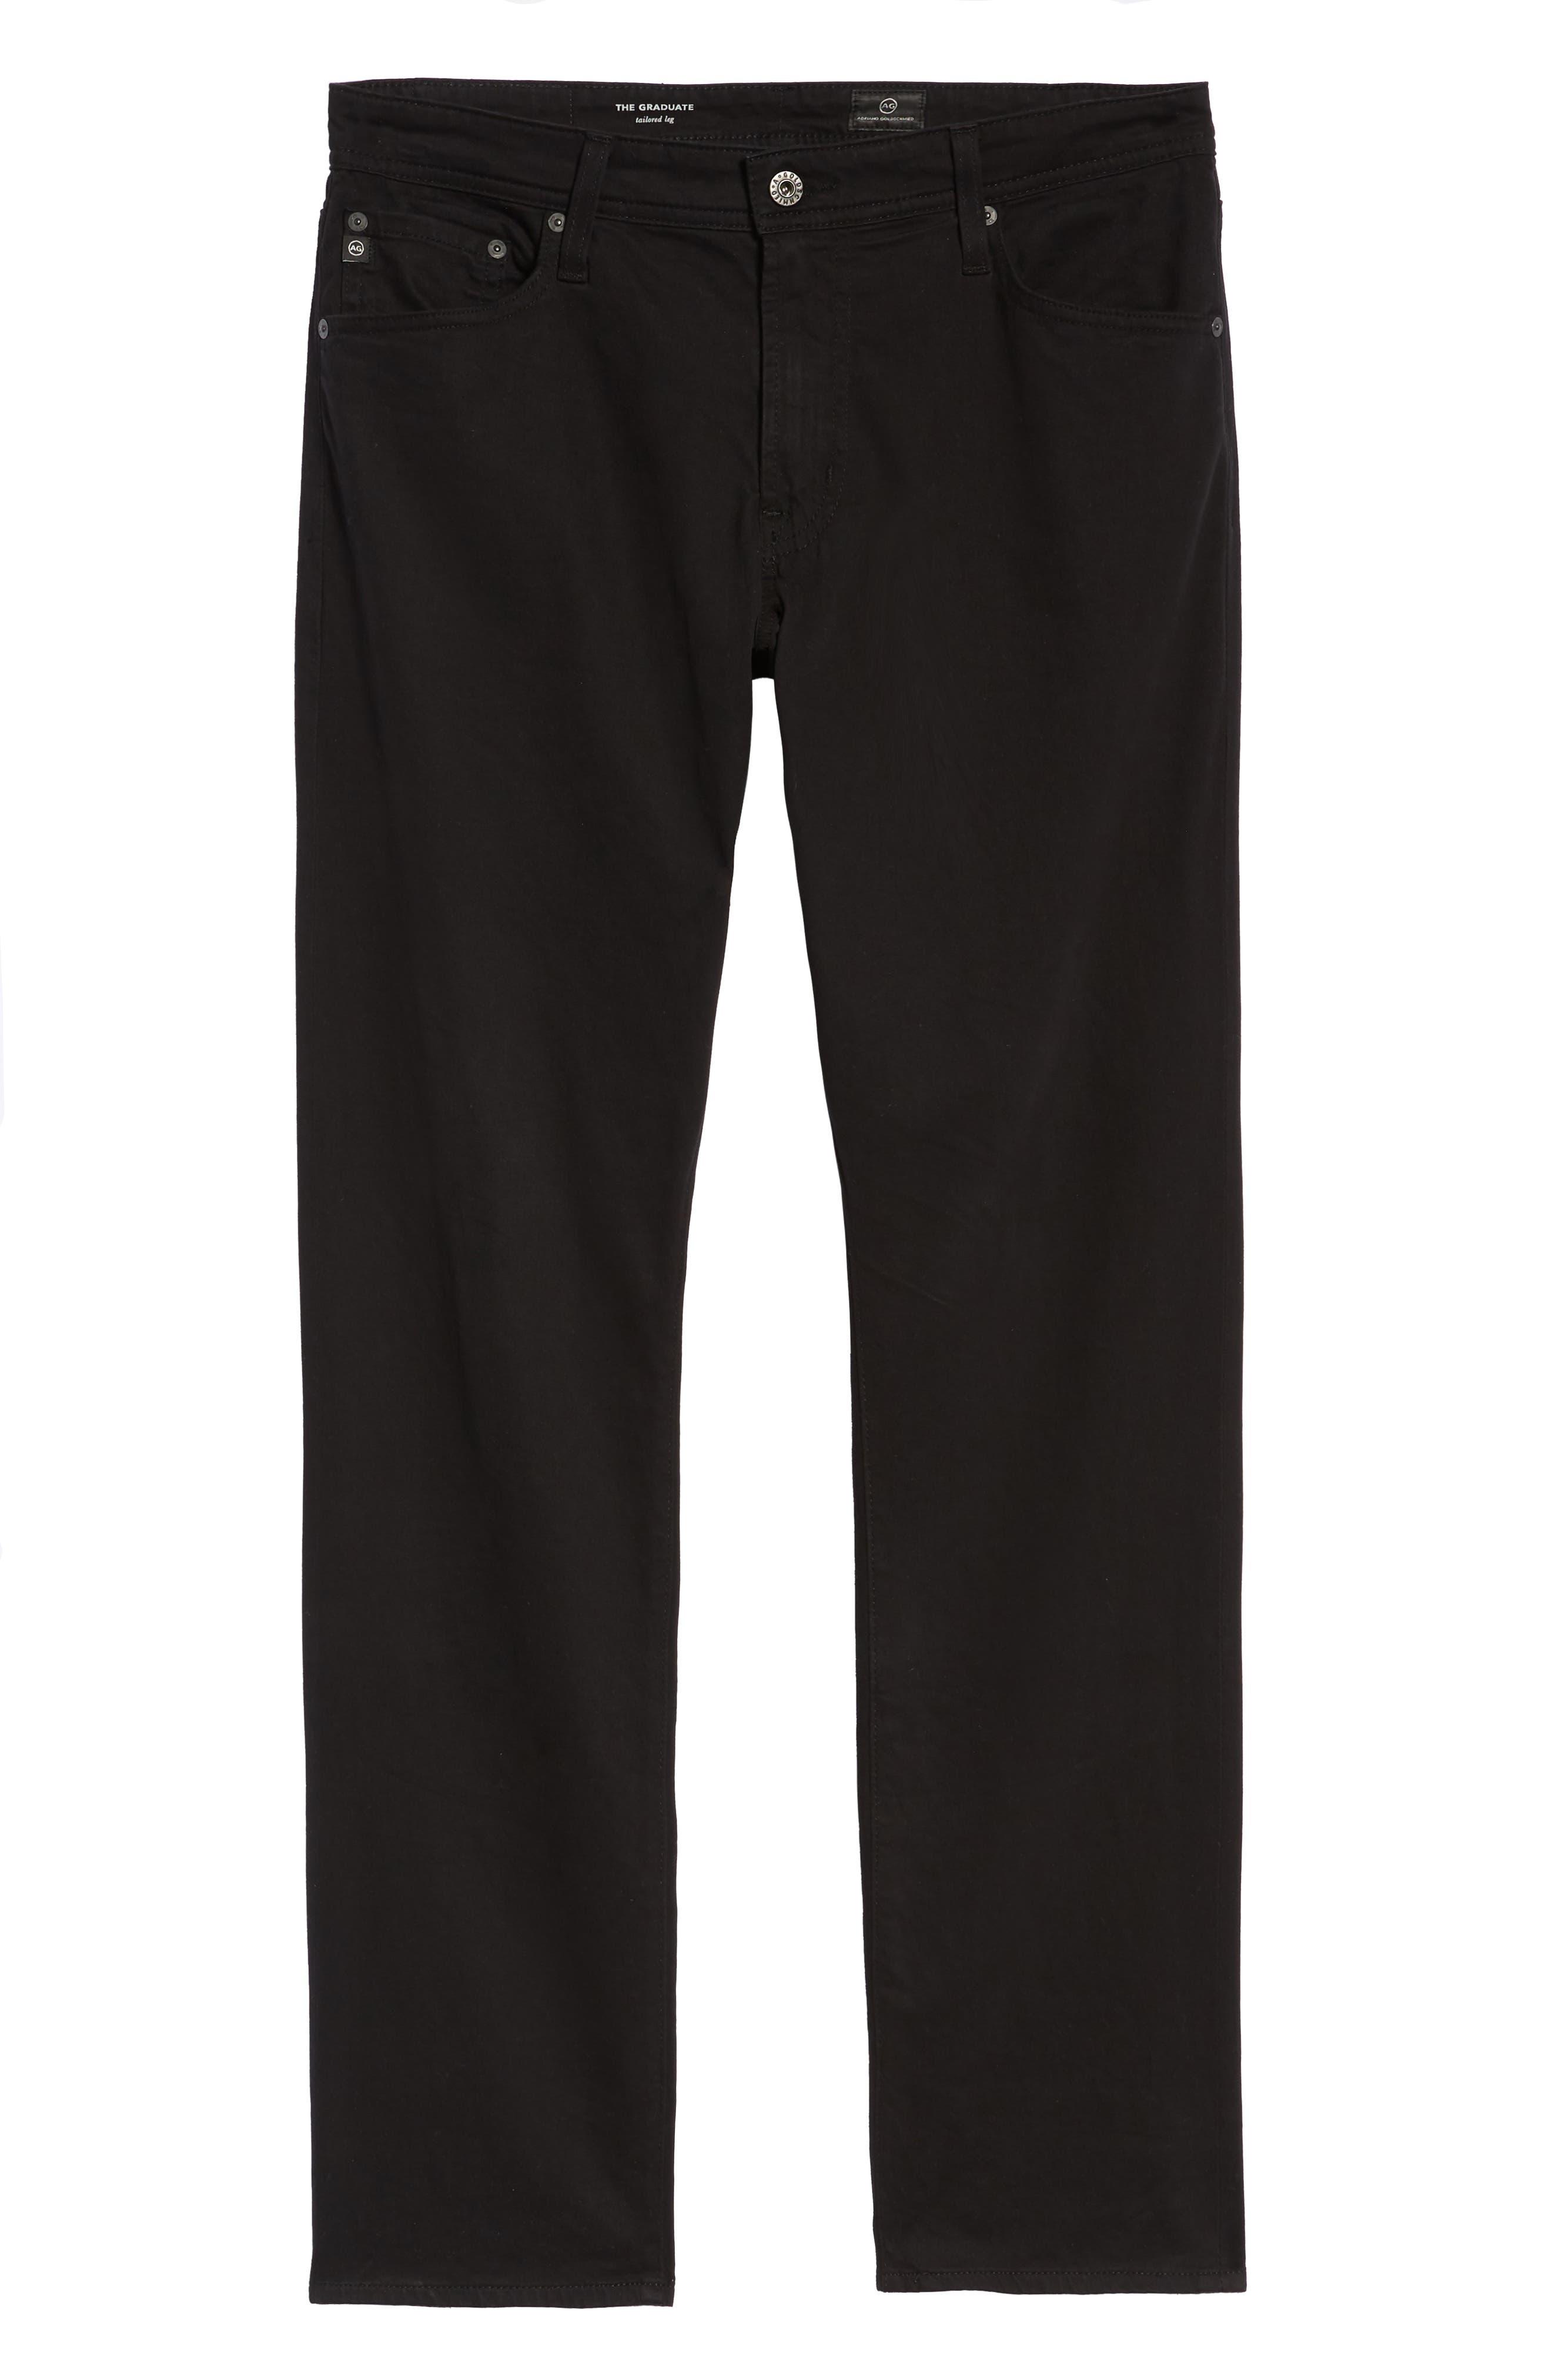 Graduate SUD Slim Straight Leg Pants,                             Alternate thumbnail 7, color,                             BLACK